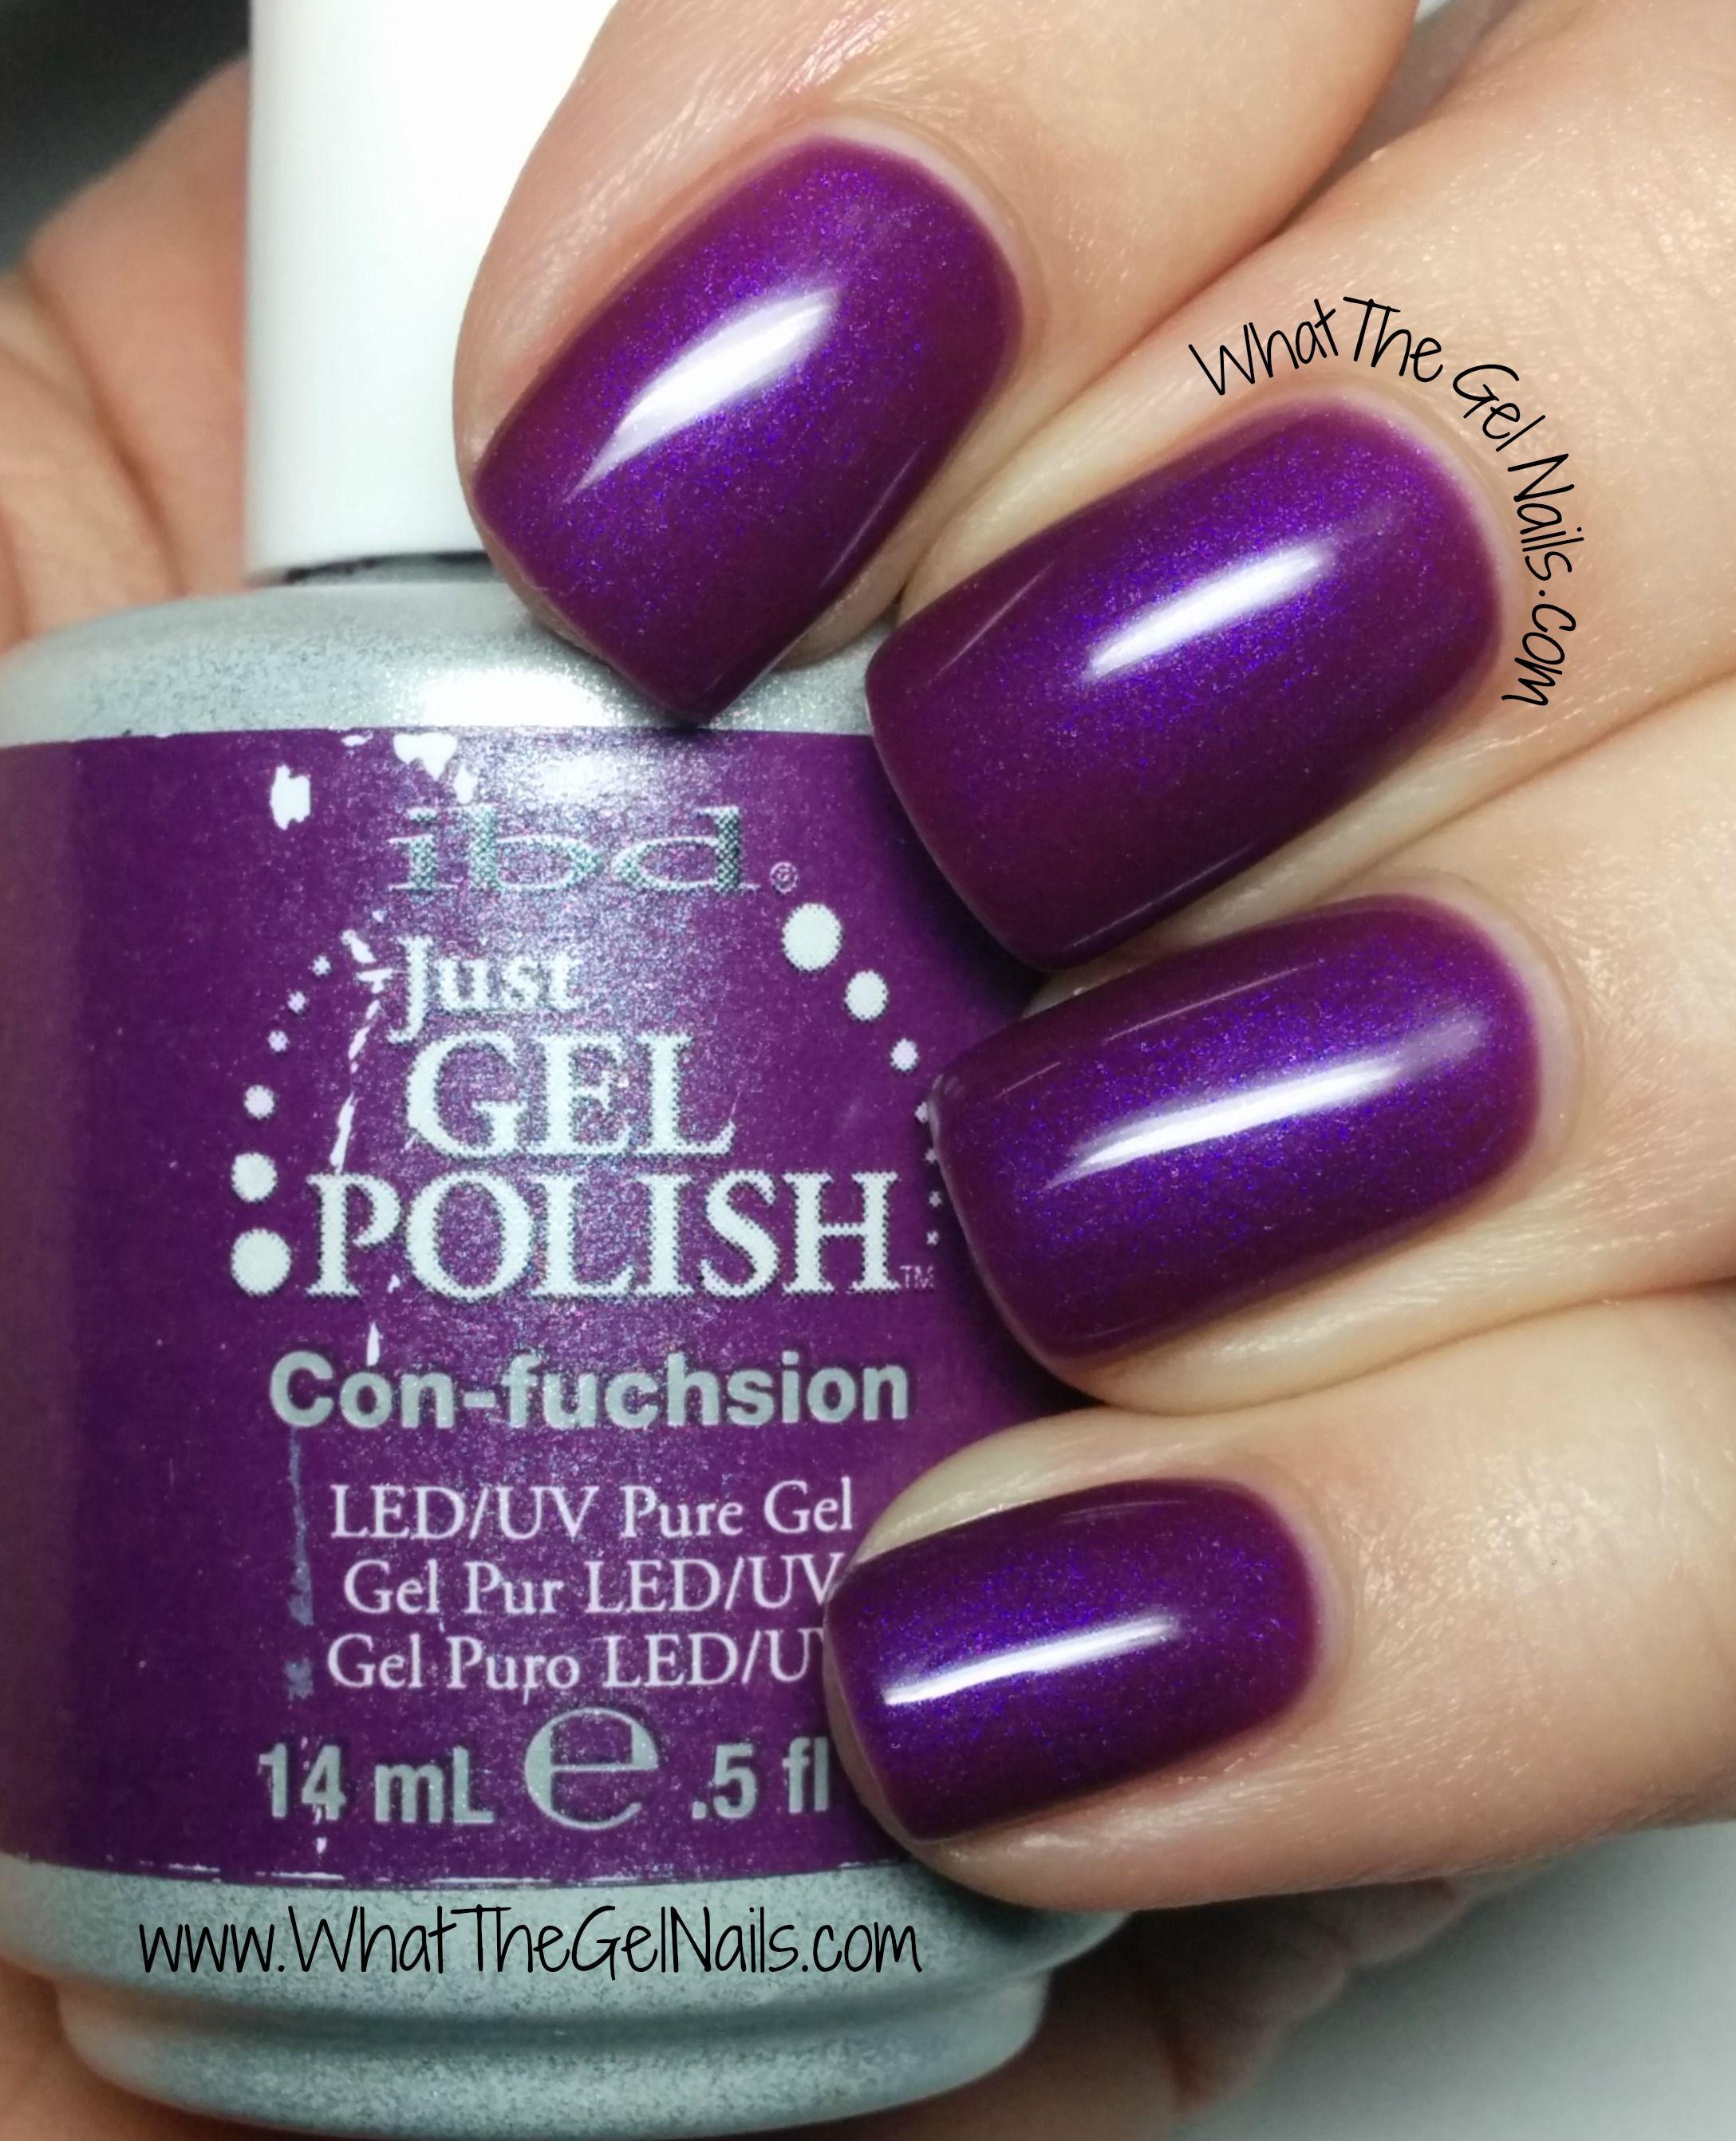 ibd con-fuchsion, plus more ibd just gel nail polish colors | ibd